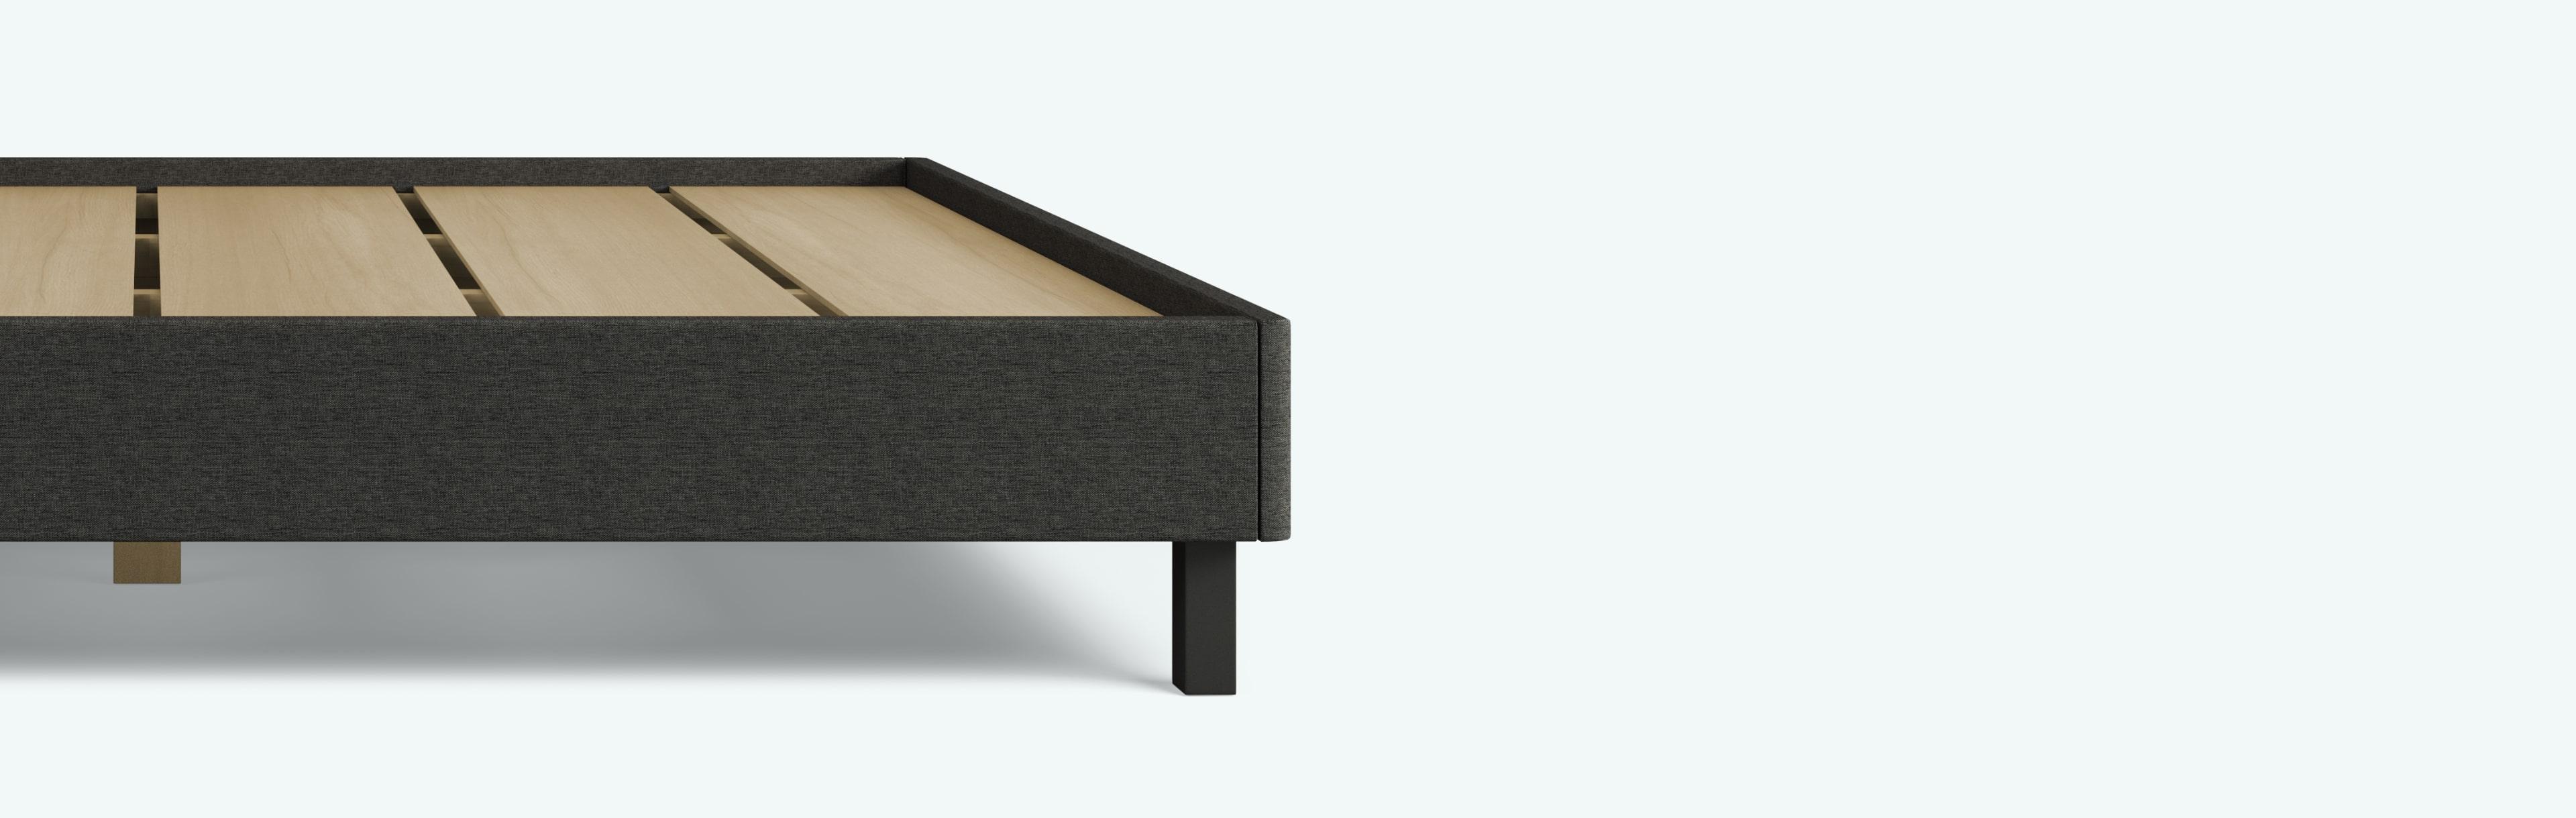 Vaya Platform Bed cutaway